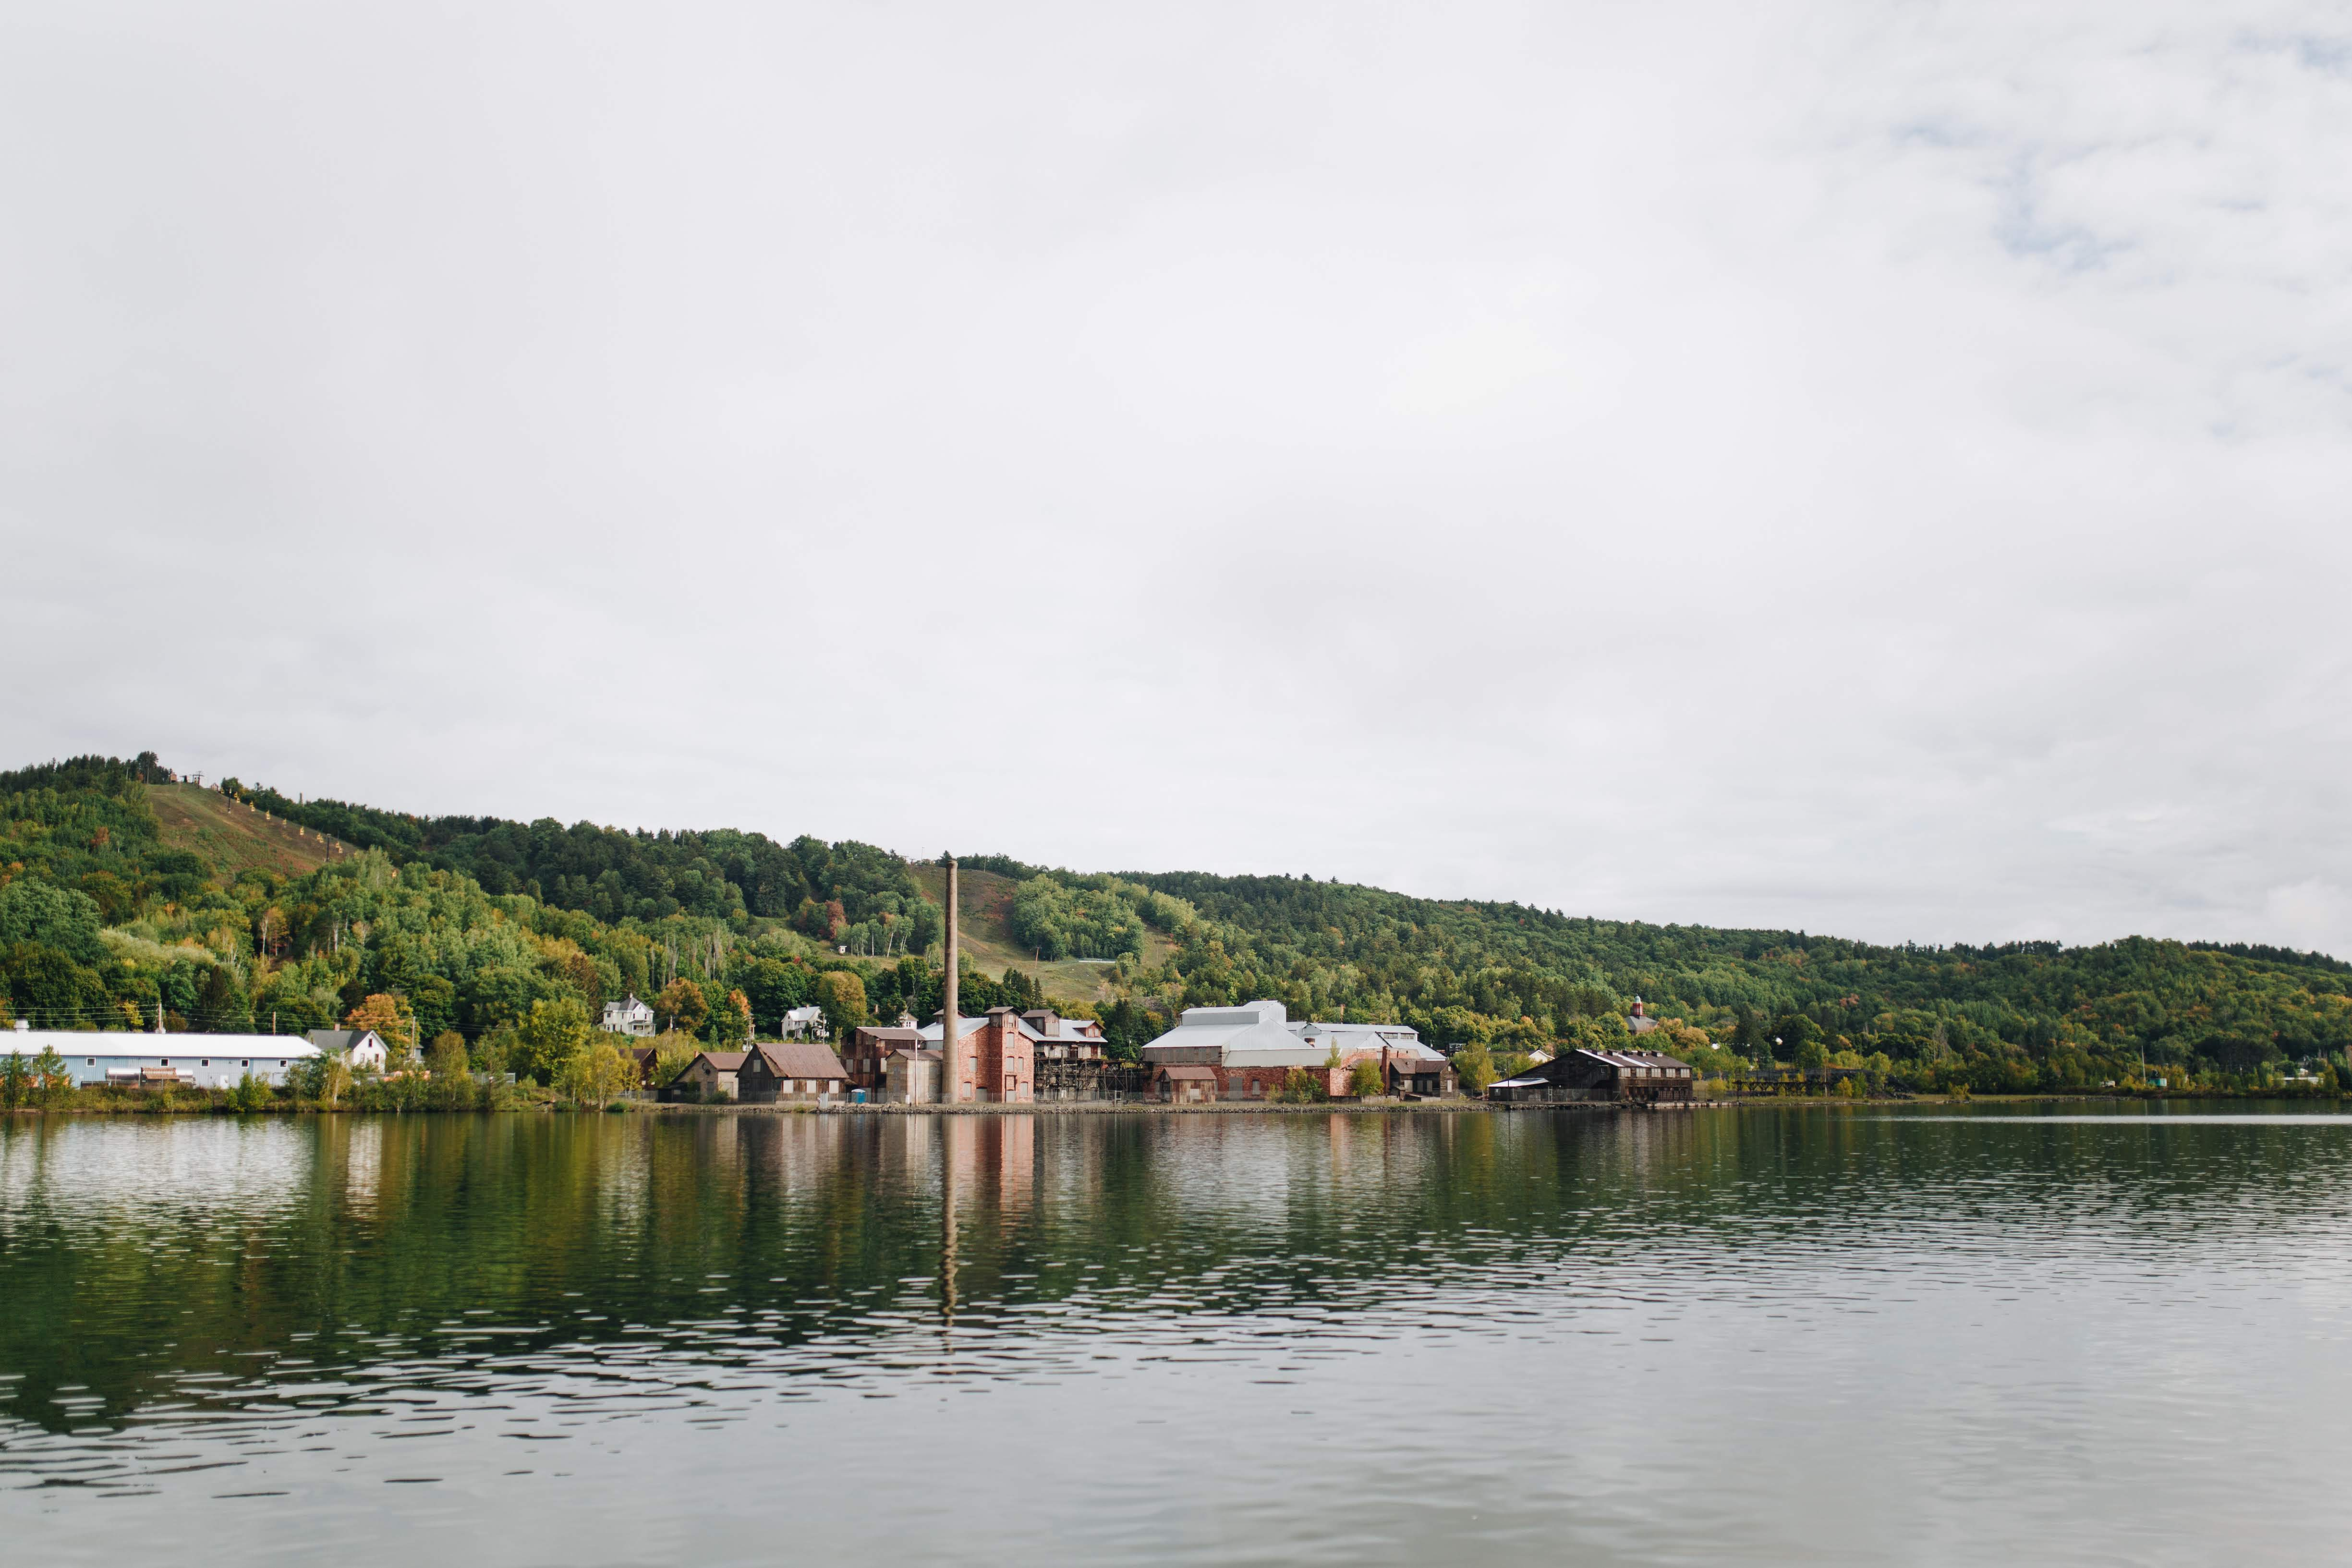 Portage Lake Shipping Canal